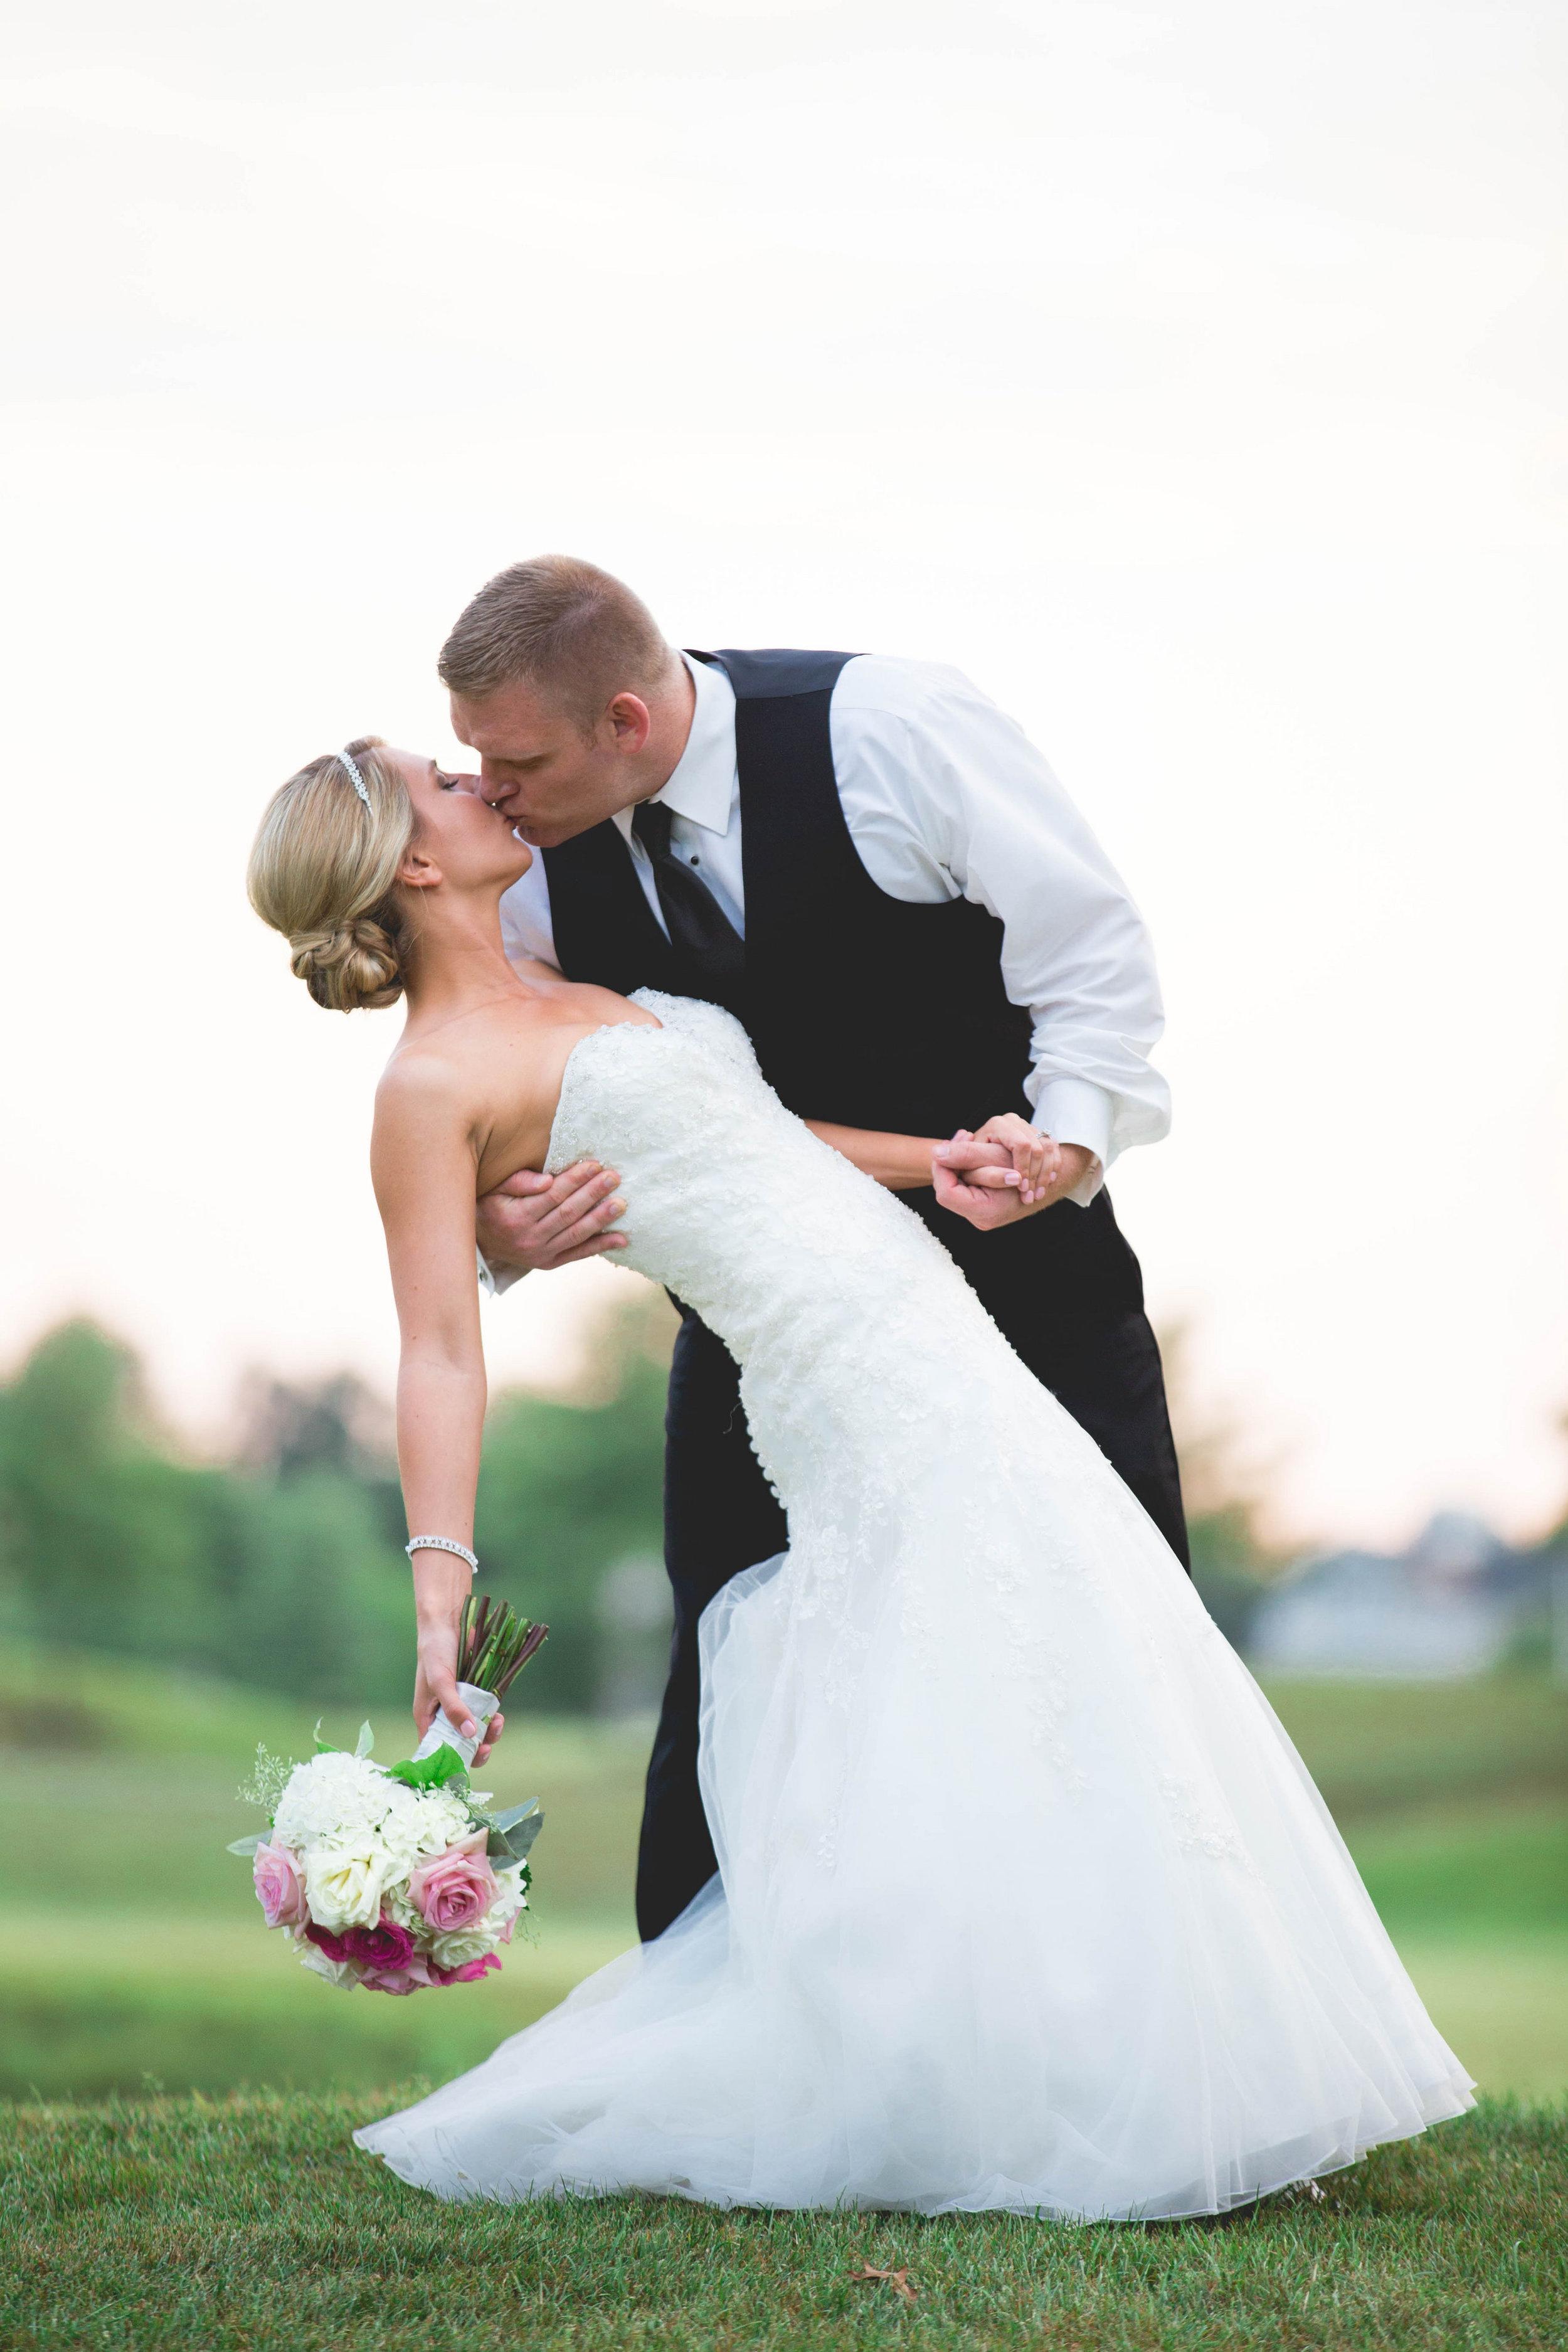 Donelson Wedding-Donelson-0434.jpg